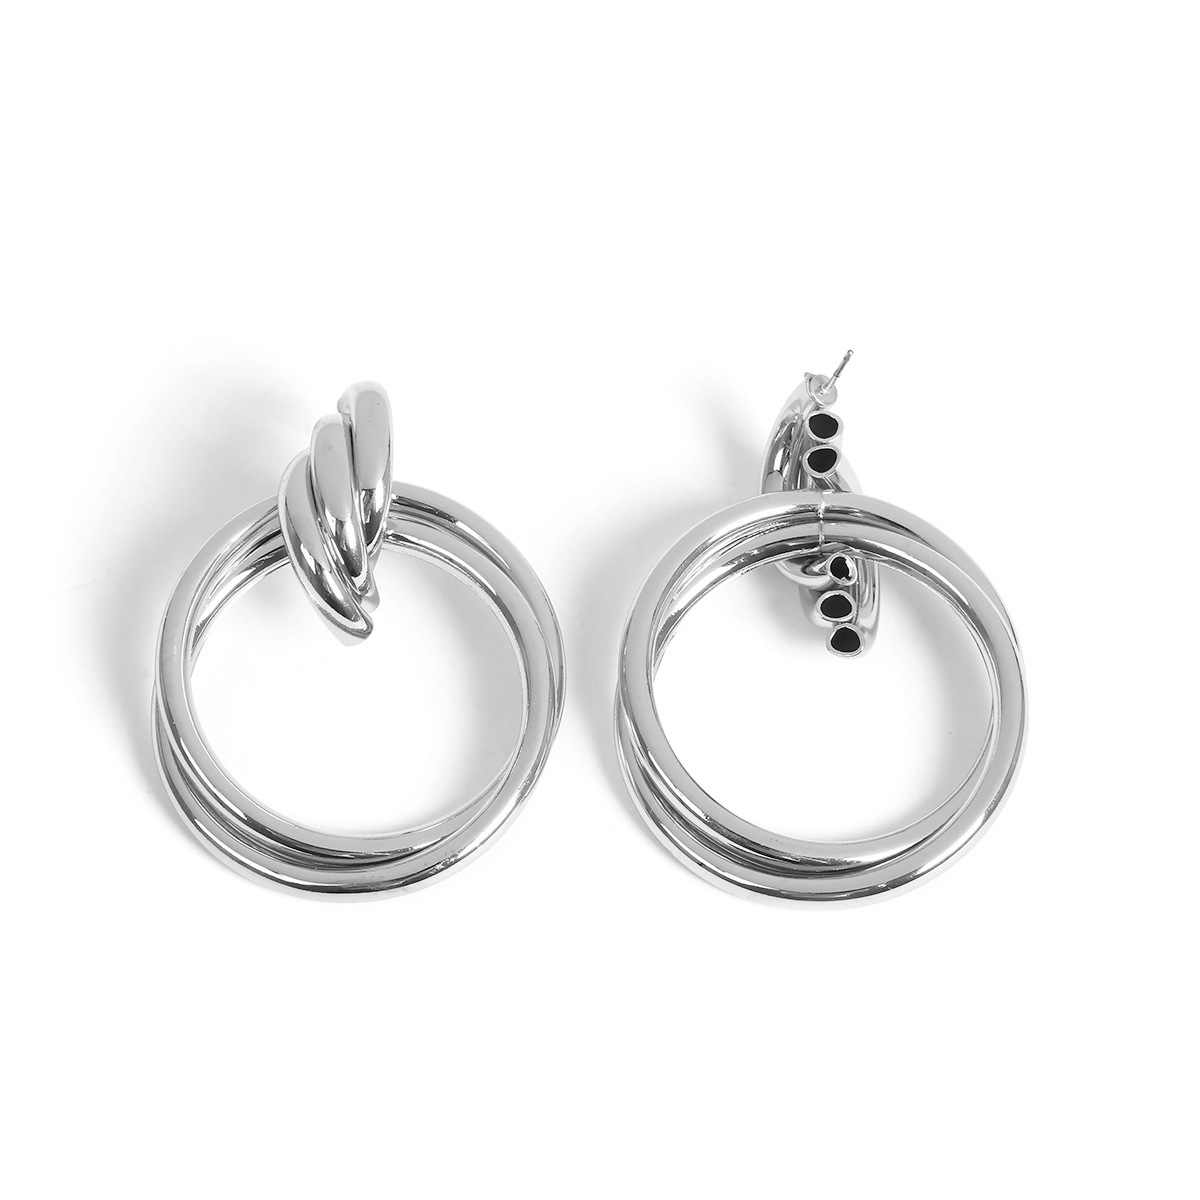 f7db65c1b ... 50 MM Big Gold Hoops Earrings Minimalist Thick Tube Round Circle Rings  Earrings For Women Zinc ...